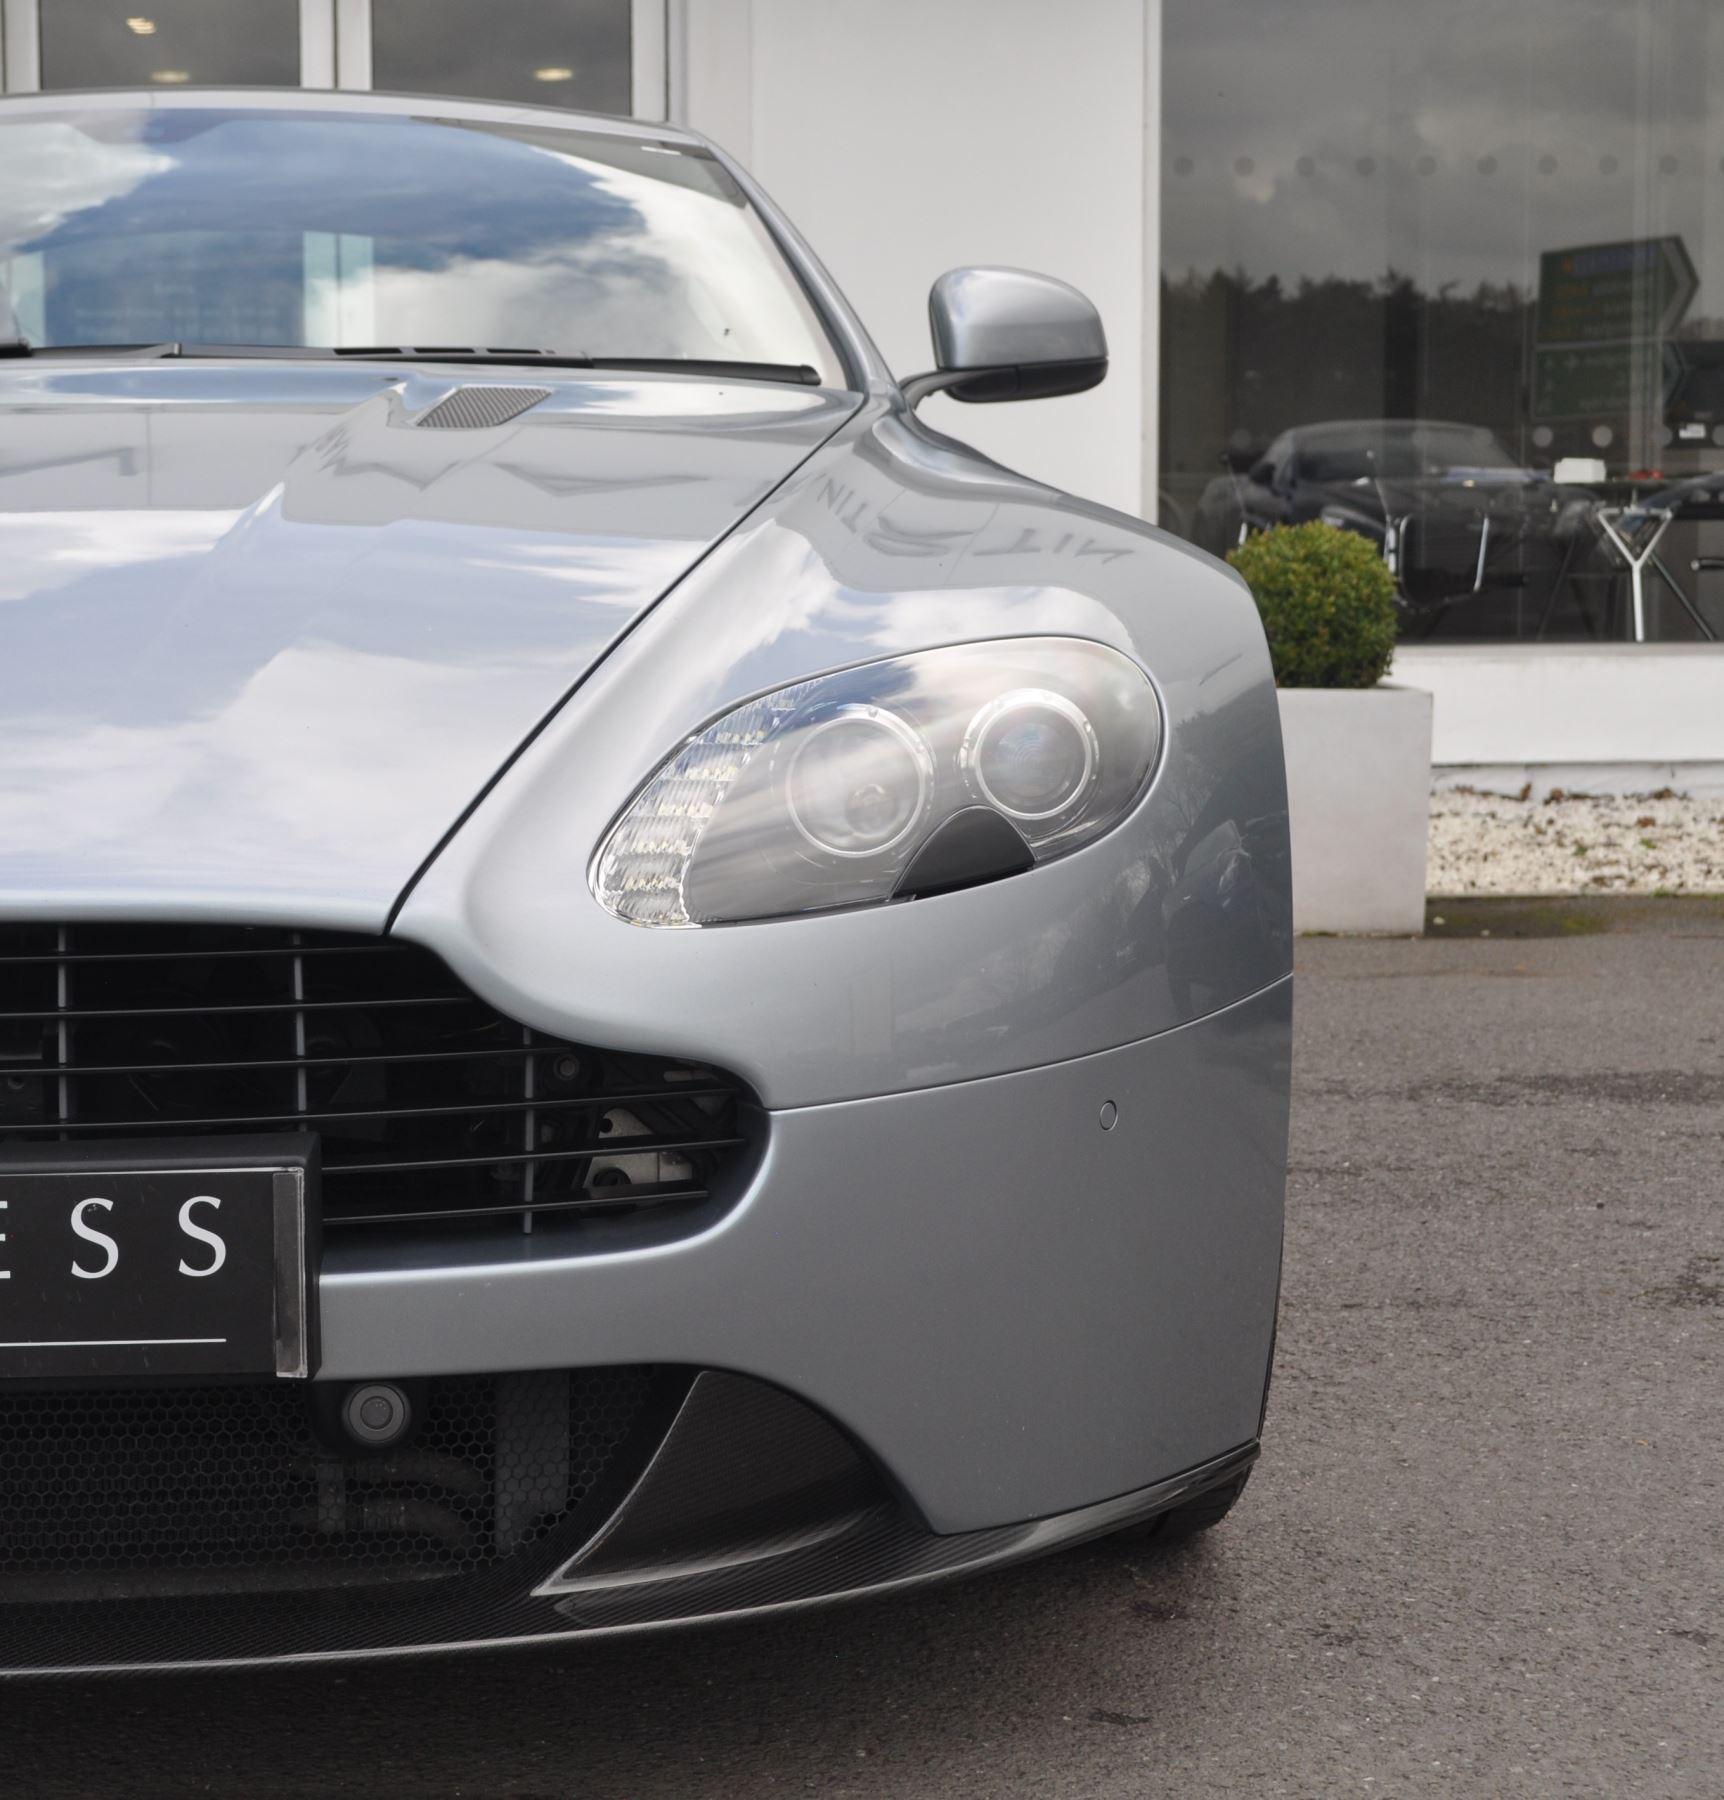 Aston Martin V8 Vantage S Coupe Coupe image 16